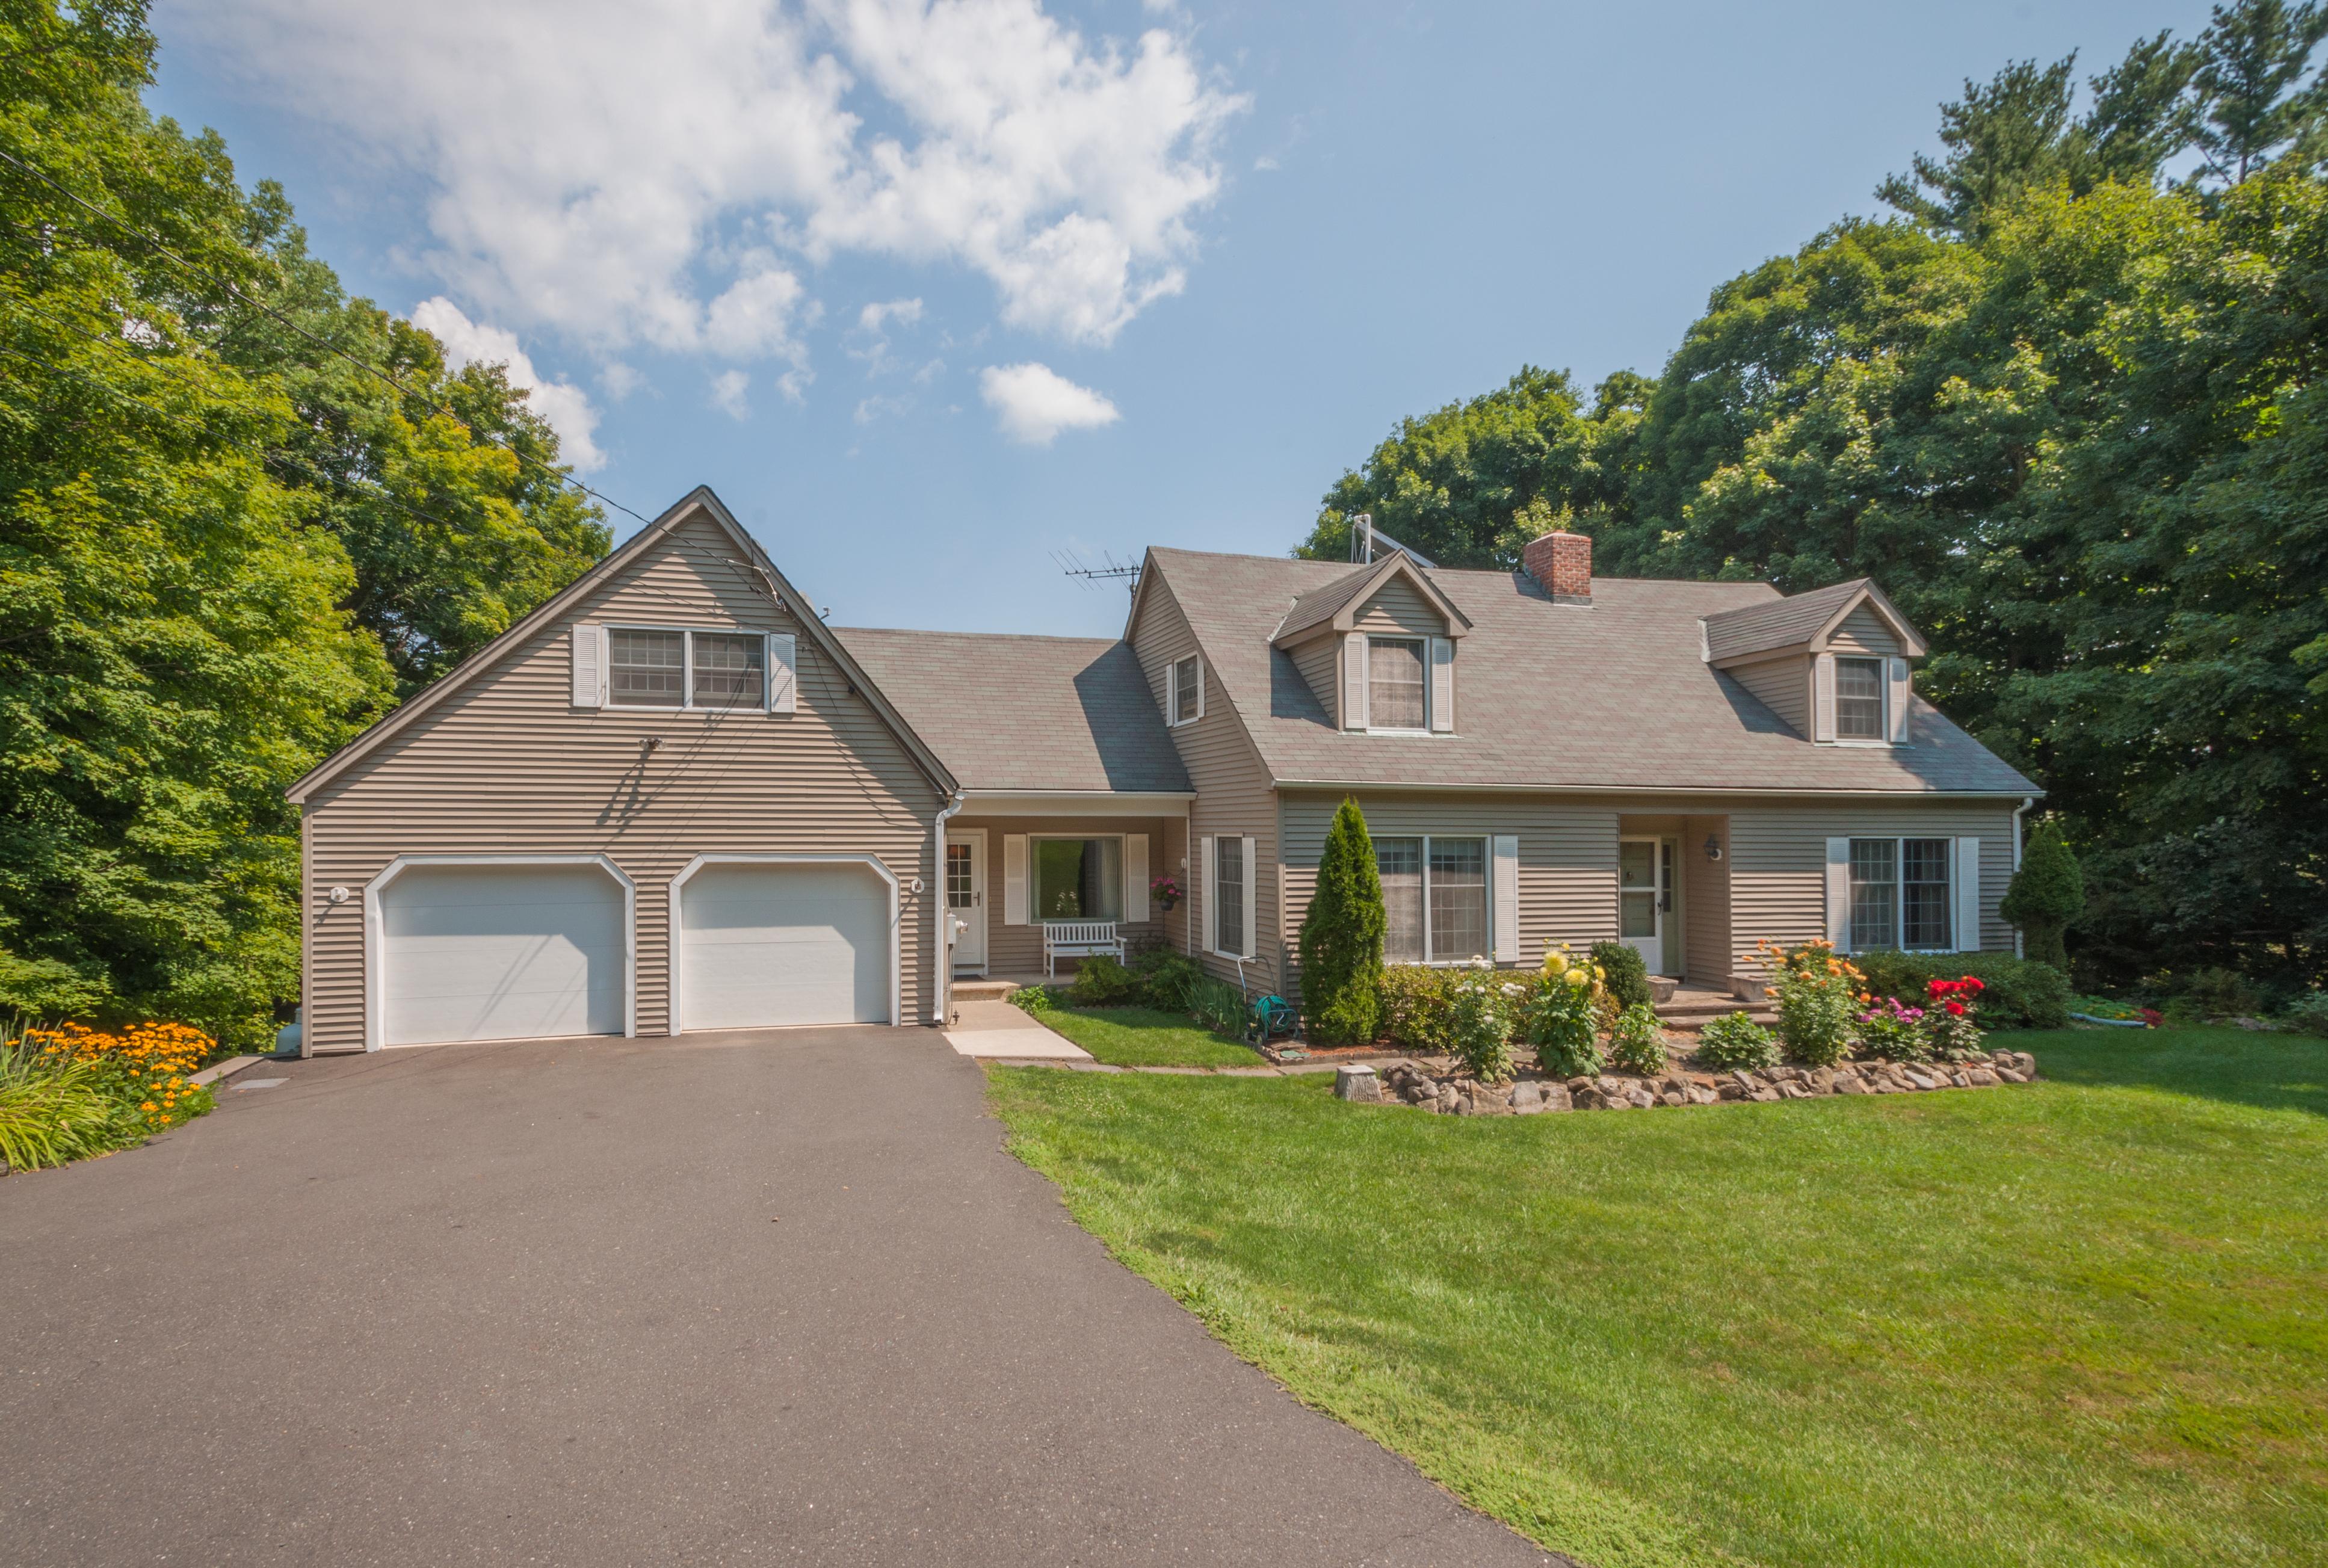 Casa para uma família para Venda às Spacious Custom Cape 153 Clapboard Ridge Road Danbury, Connecticut 06811 Estados Unidos